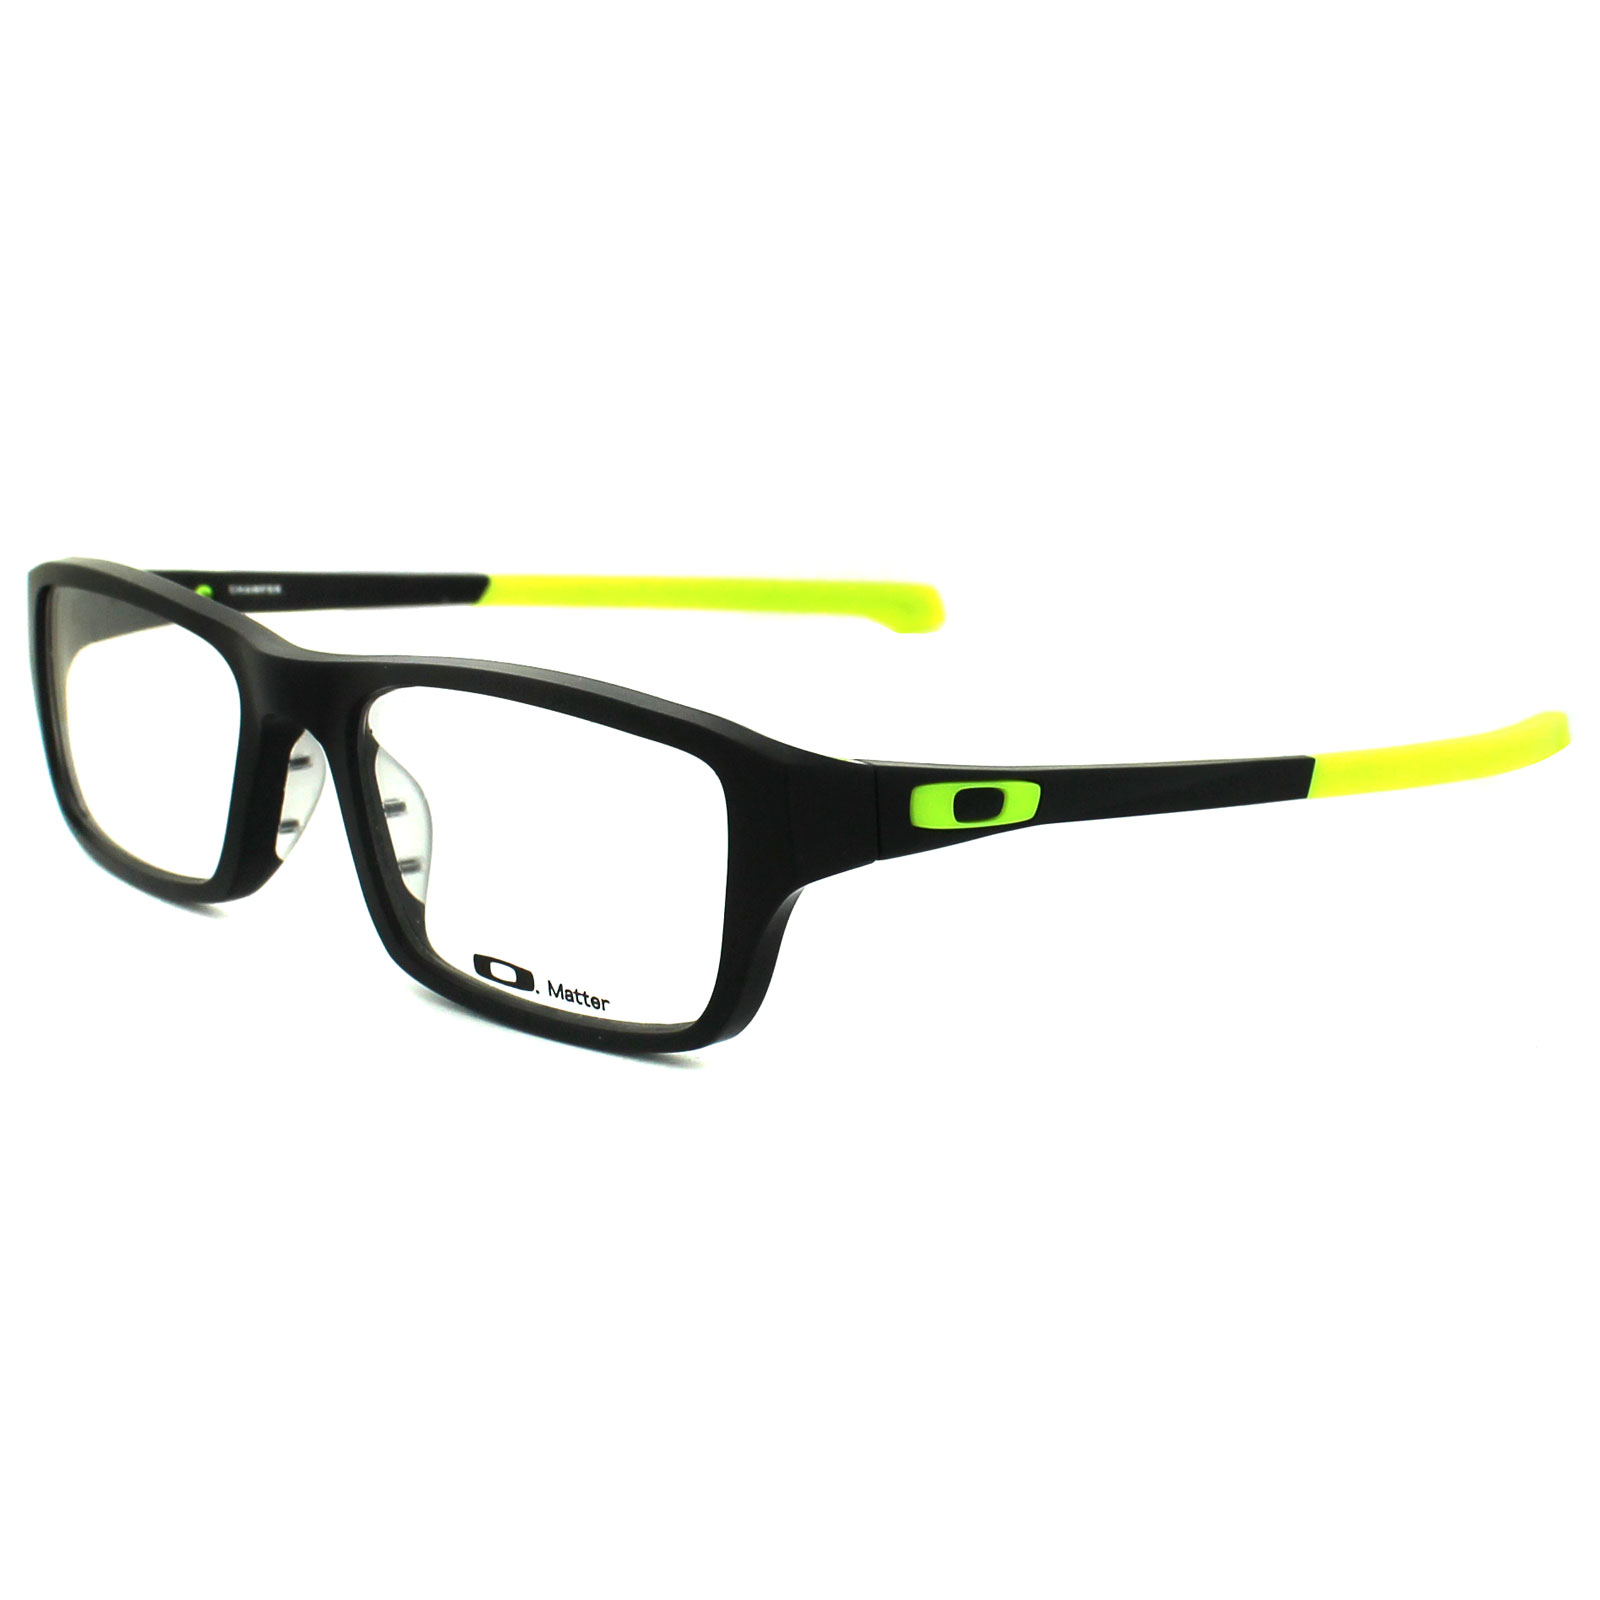 0c9a8e6fd9c5 ... prescription 93757 ab822; canada sentinel oakley glasses frames chamfer  8039 06 matt black retina burn 52709 68d32